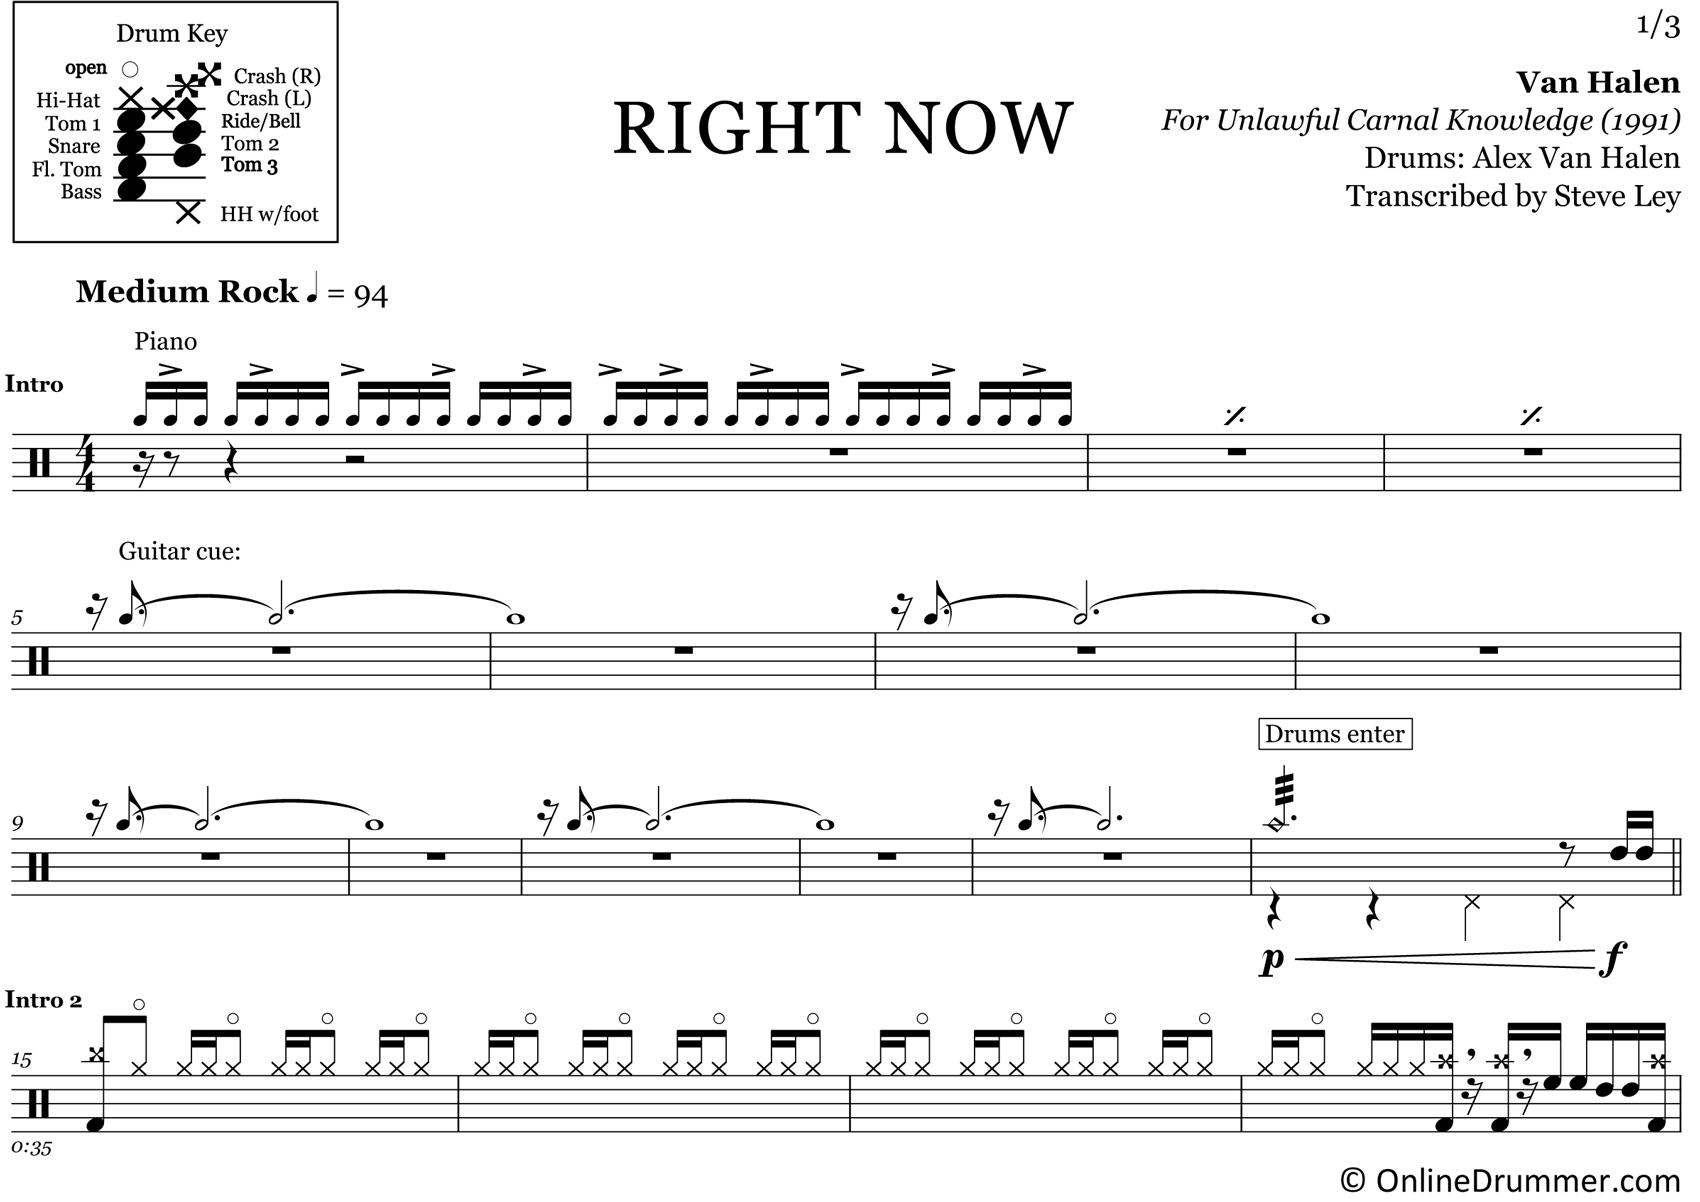 Right Now - Van Halen - Drum Sheet Music